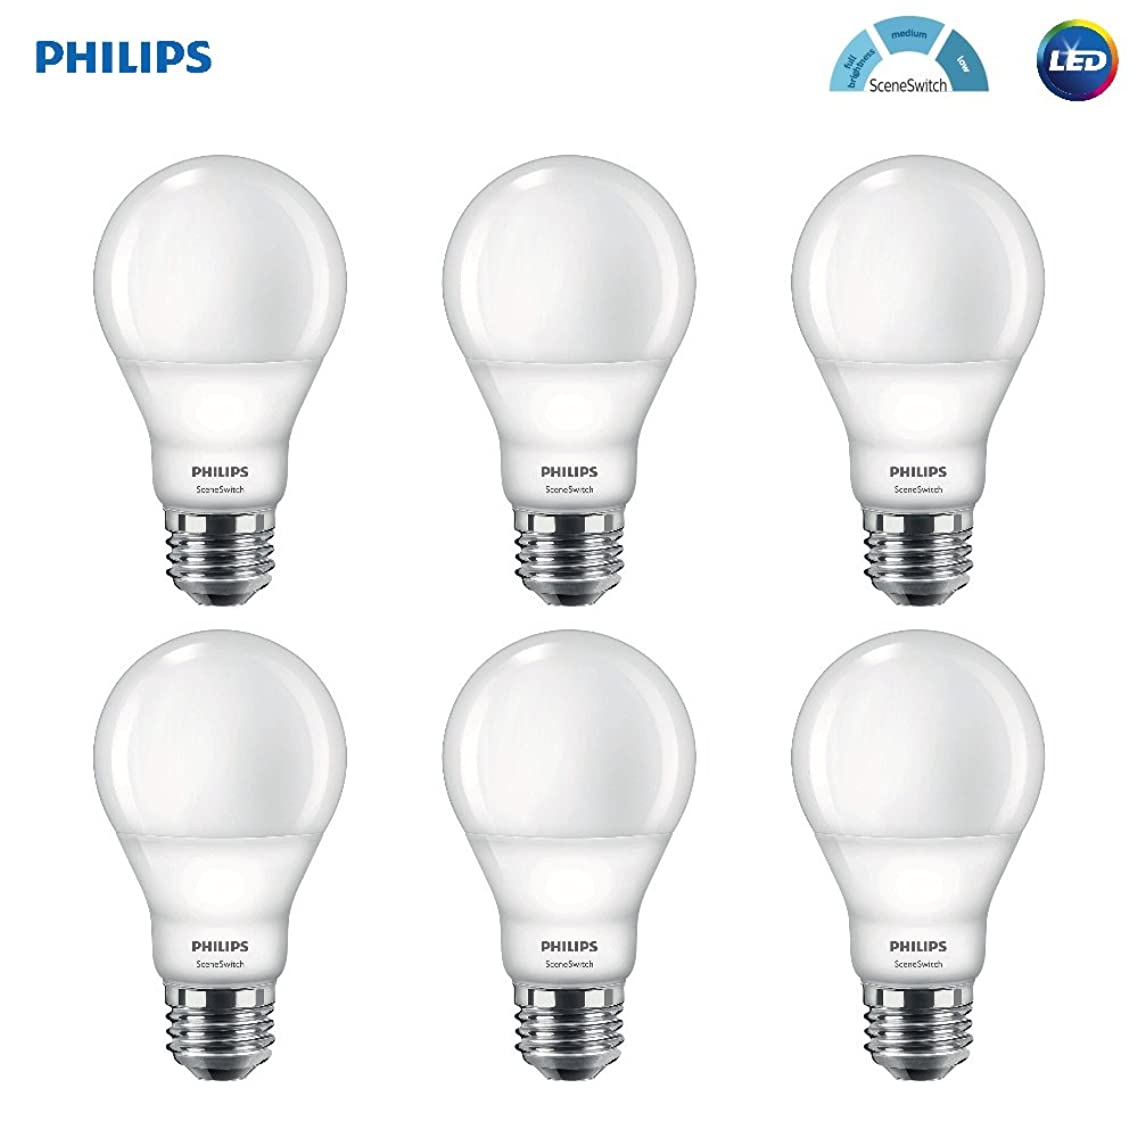 Philips LED A19 SceneSwitch Daylight 3-Setting Light Bulb: Bright/Medium/Low (60-Watt Equivalent) E26 Base, 6-Pack